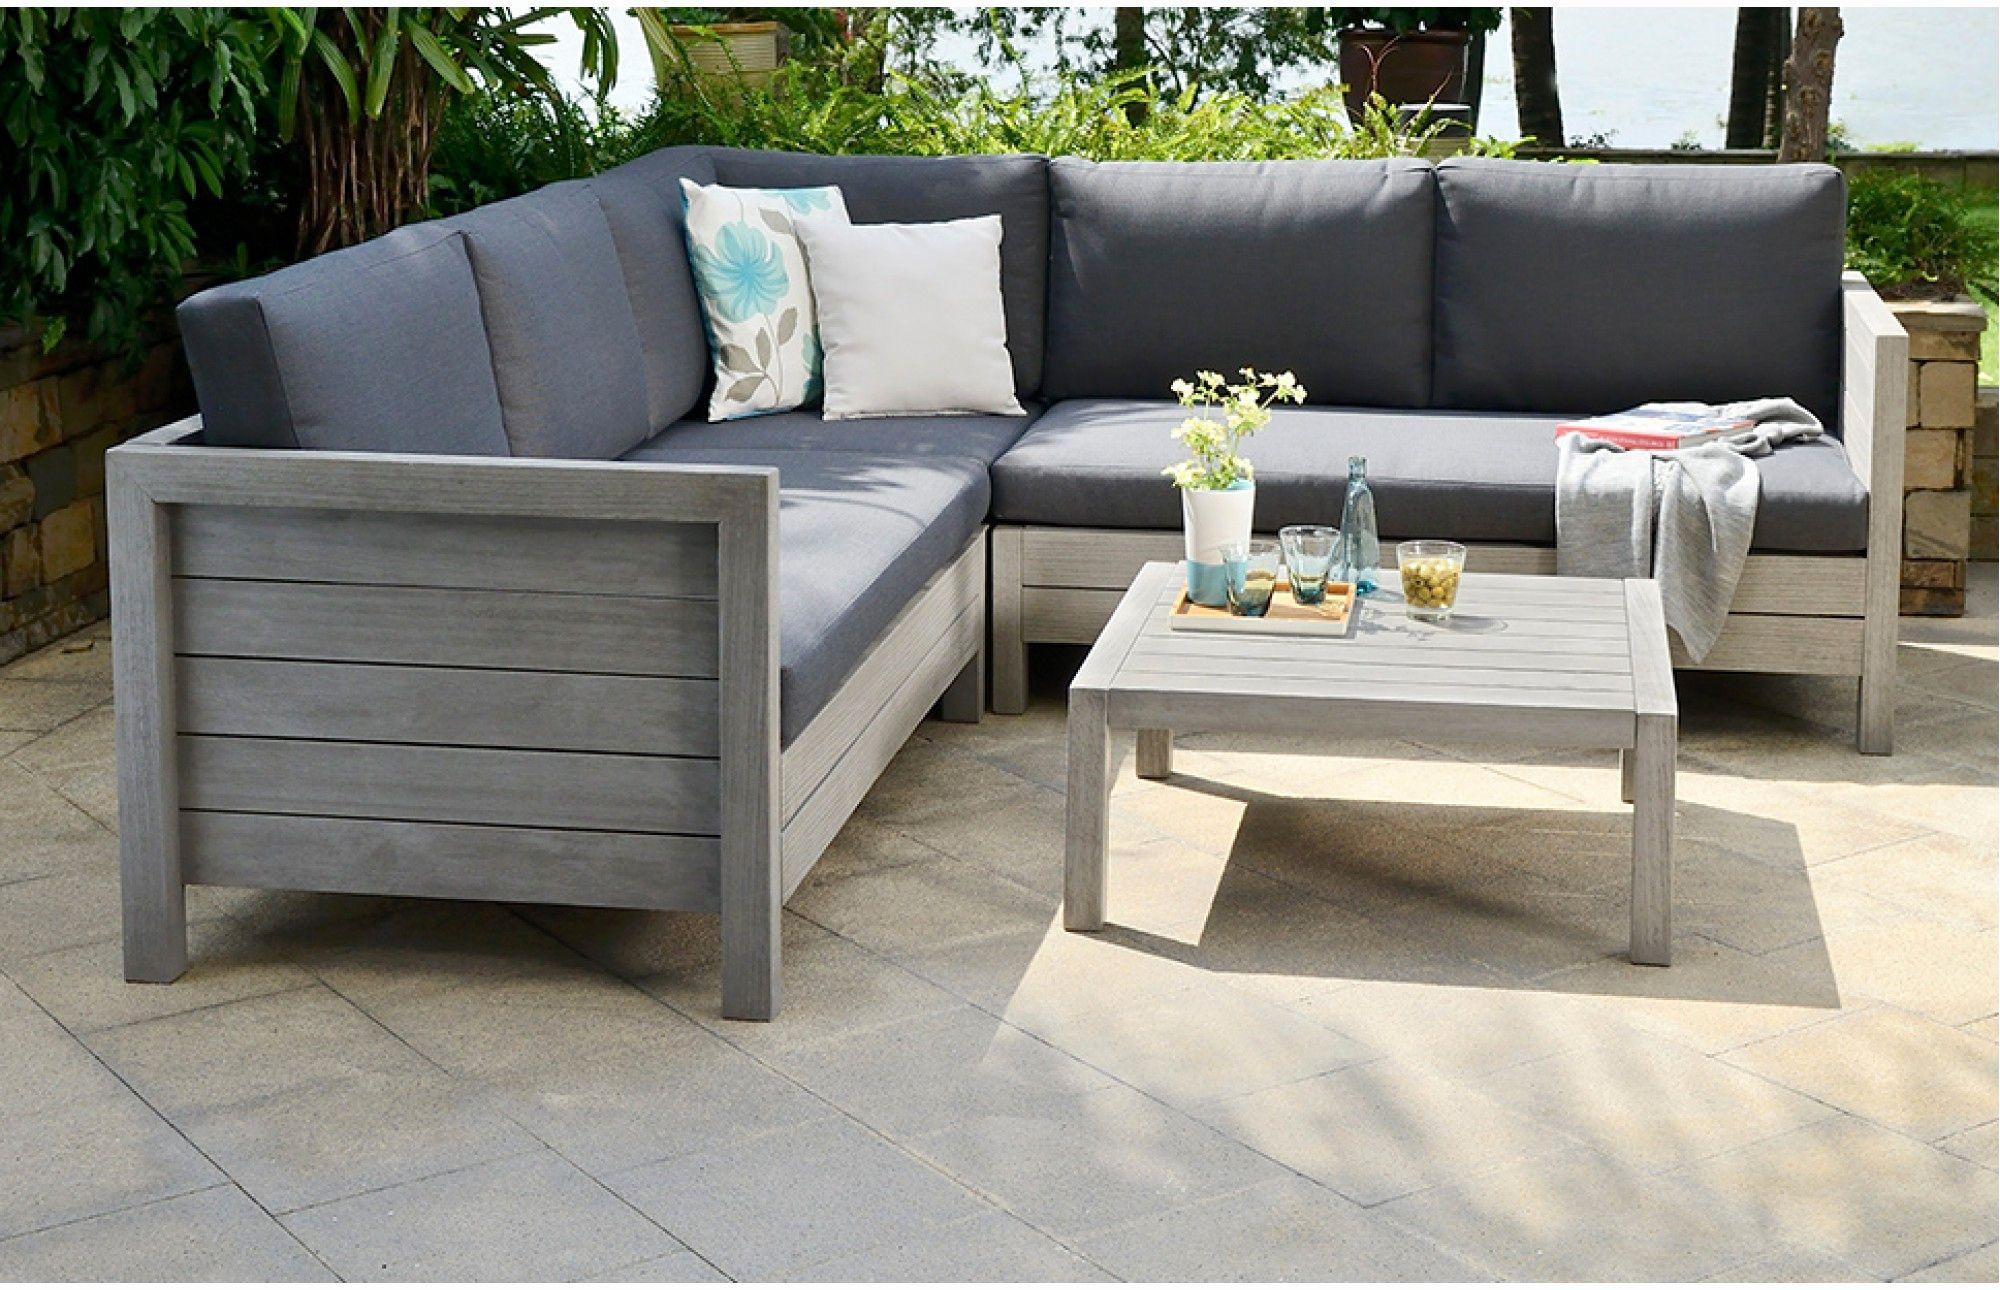 Good Corner Sofa Outdoor Furniture Image Phenomenal Corner